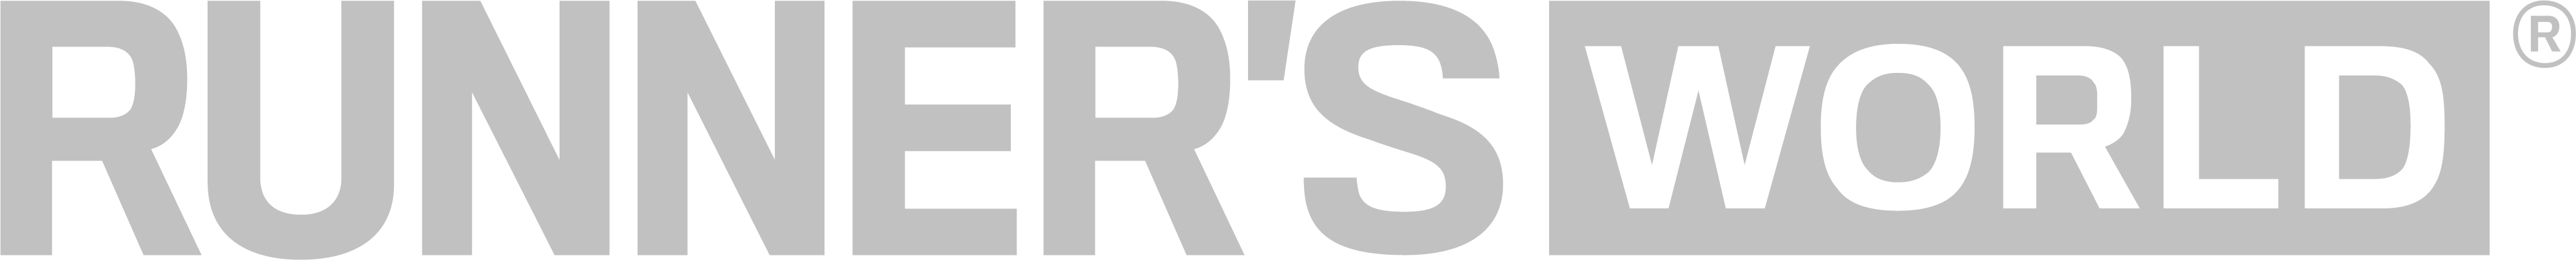 Runners world logo